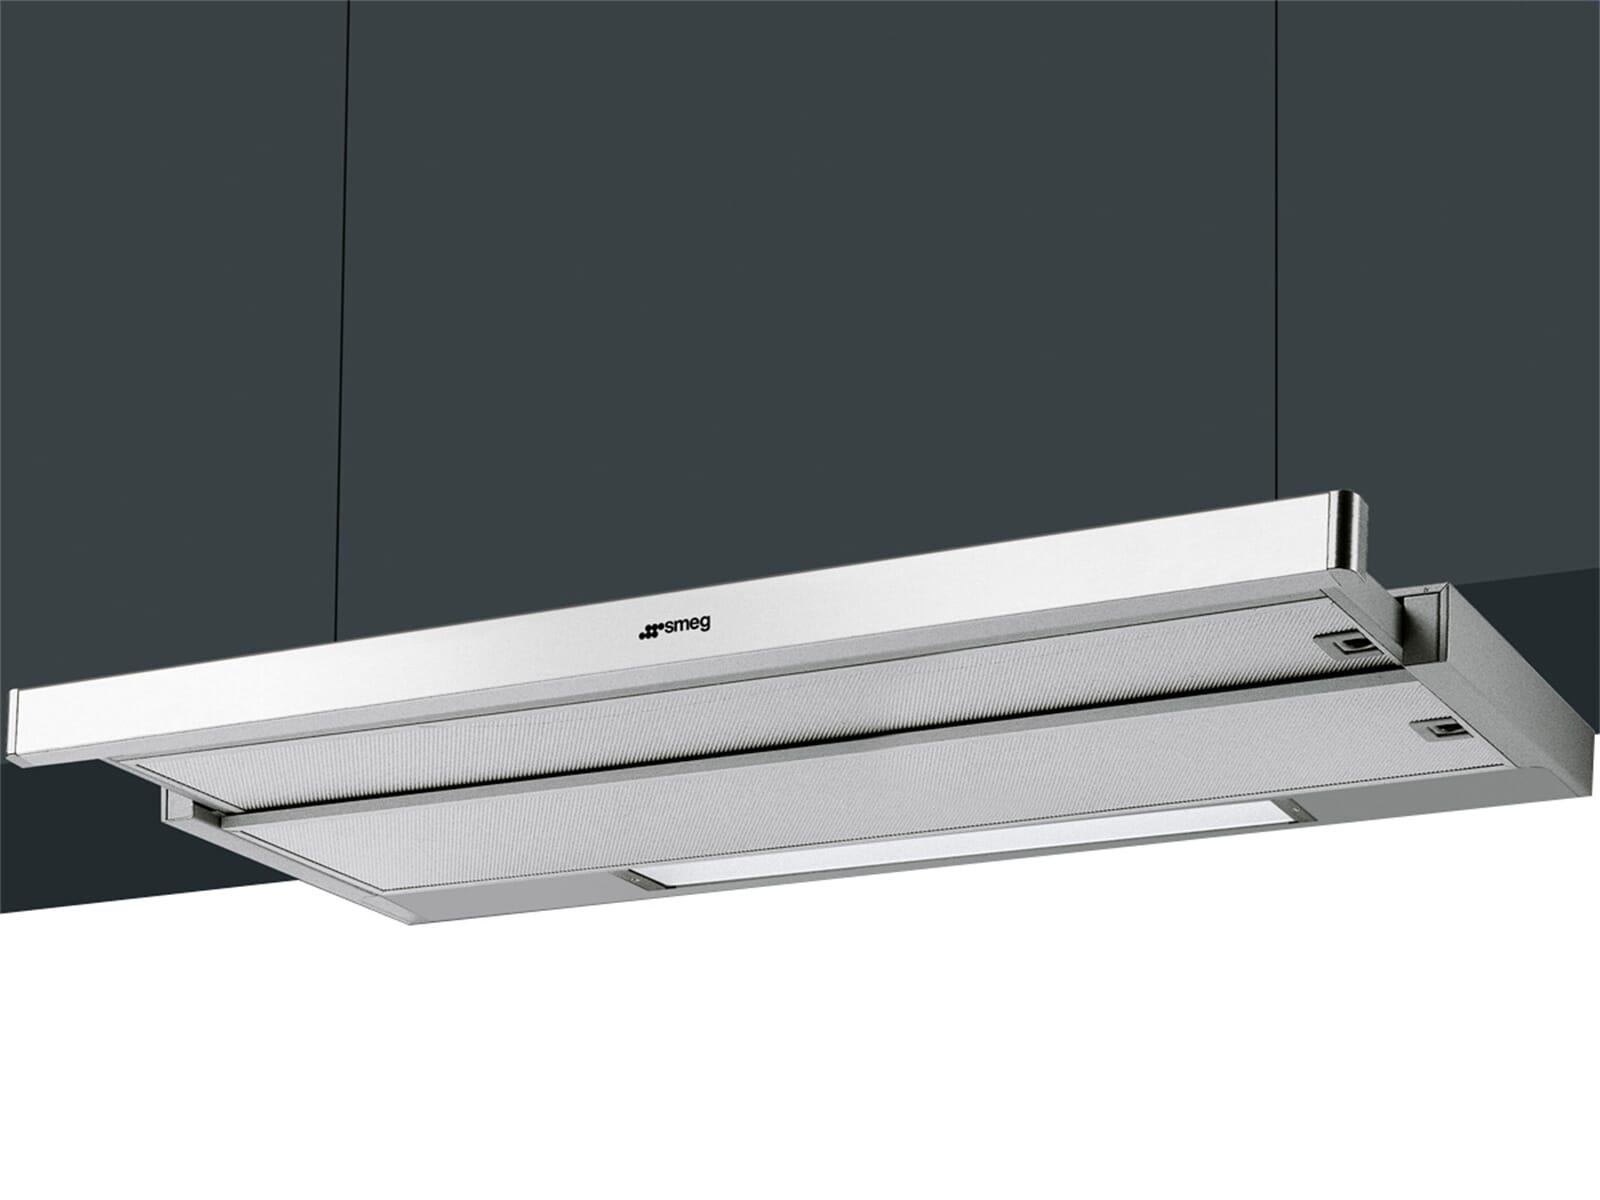 smeg kset6xe flachschirm dunstabzugshaube edelstahl f r 198 90 eur. Black Bedroom Furniture Sets. Home Design Ideas